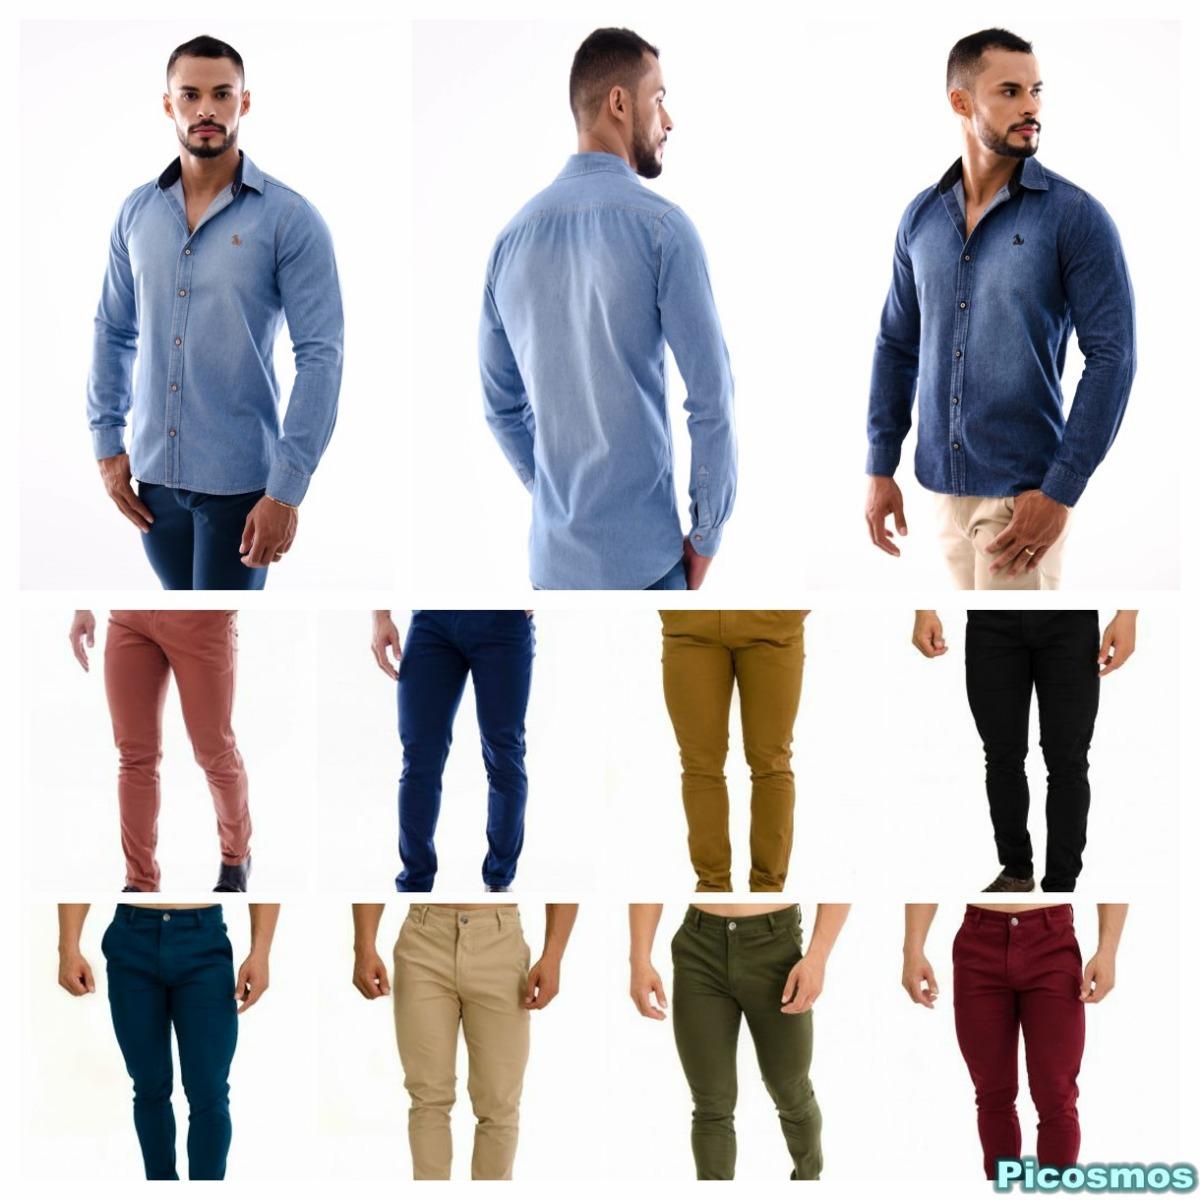 ab769d1cb5 Kit Amil Calça Bolso Embutido + Camisa Mister Jeans Slim - R  179